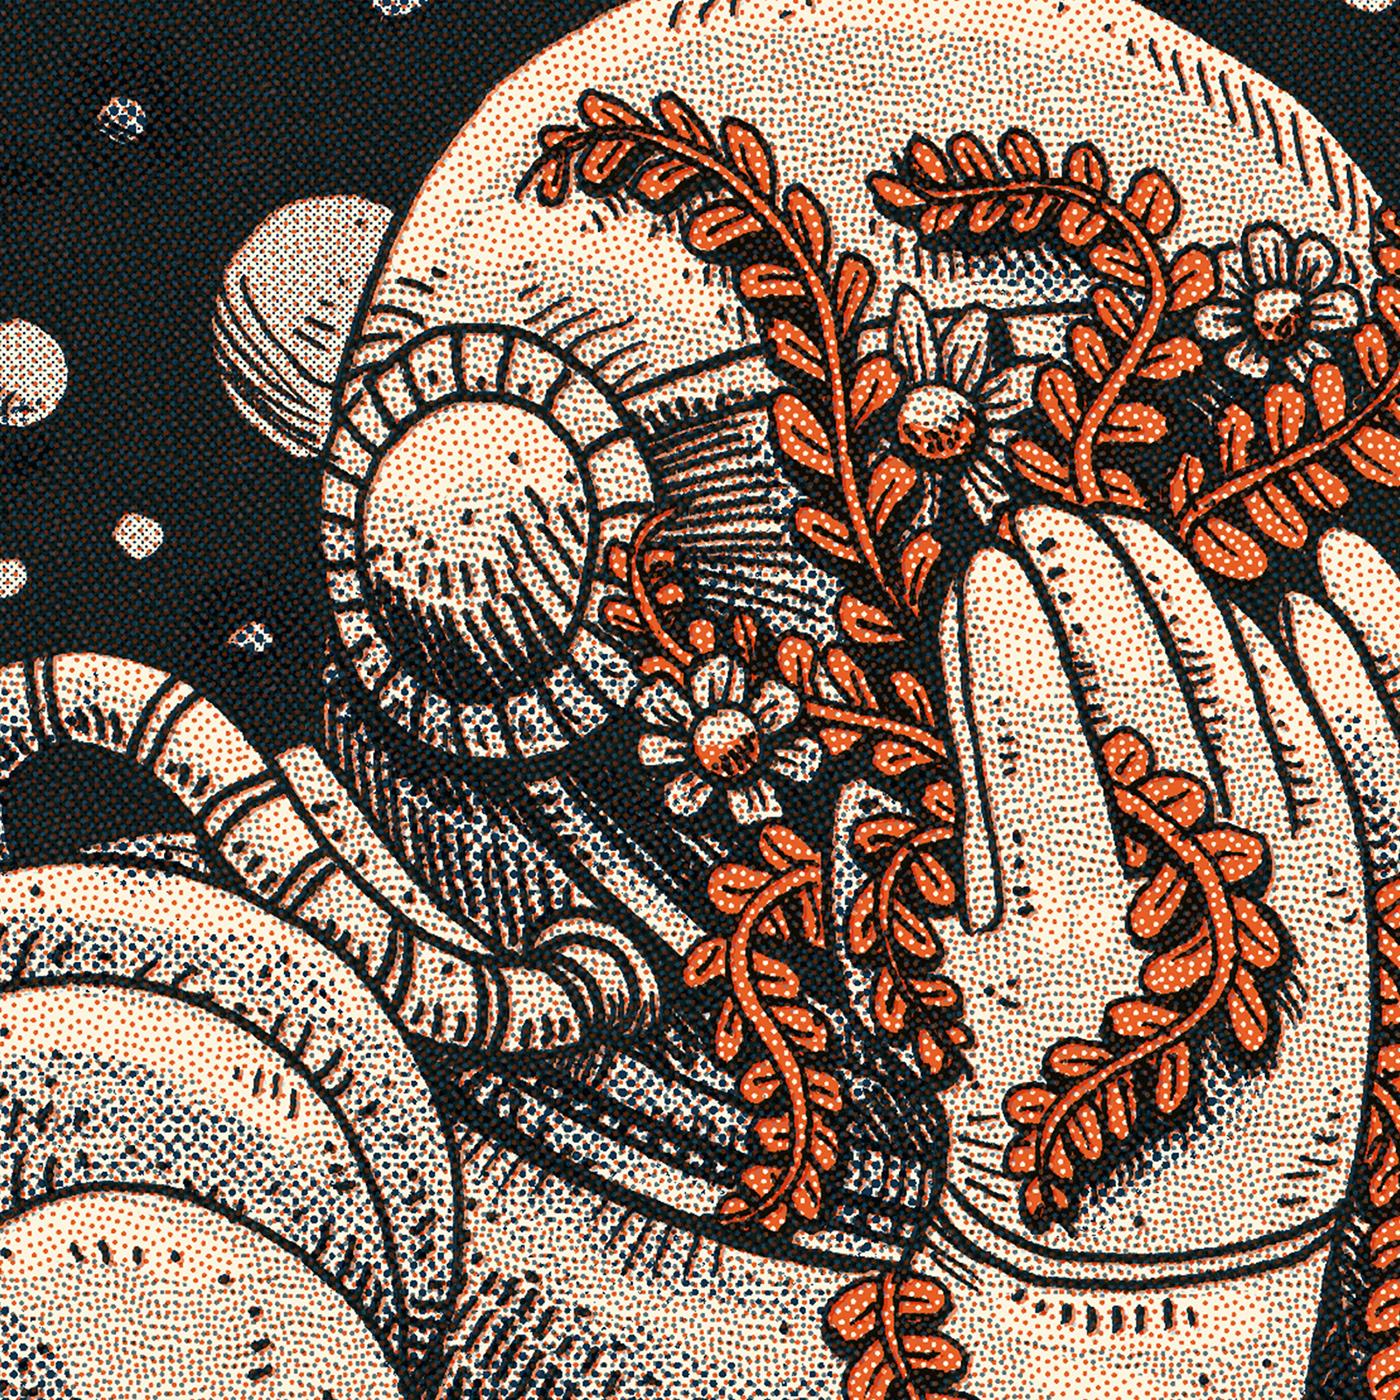 Space  astronaut cosmos universe garden skull outerspace ink sketchbook moleskine